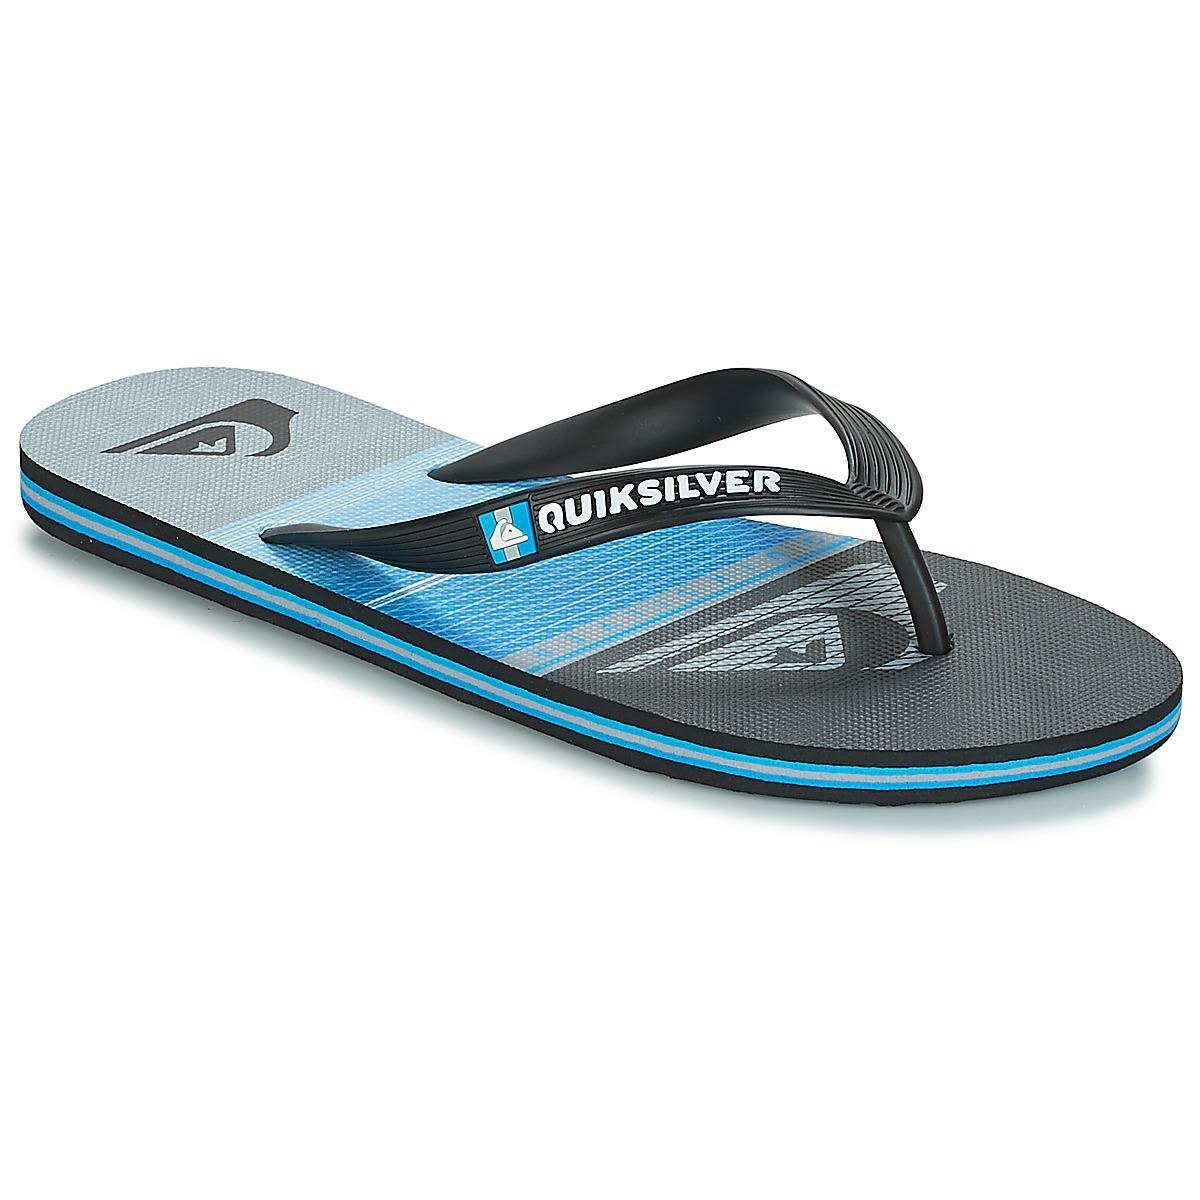 5ee3fdce5ed9 Quiksilver - Molohighlinslab M Sndl Xkbs Men s Flip Flops   Sandals (shoes)  In Black. View fullscreen